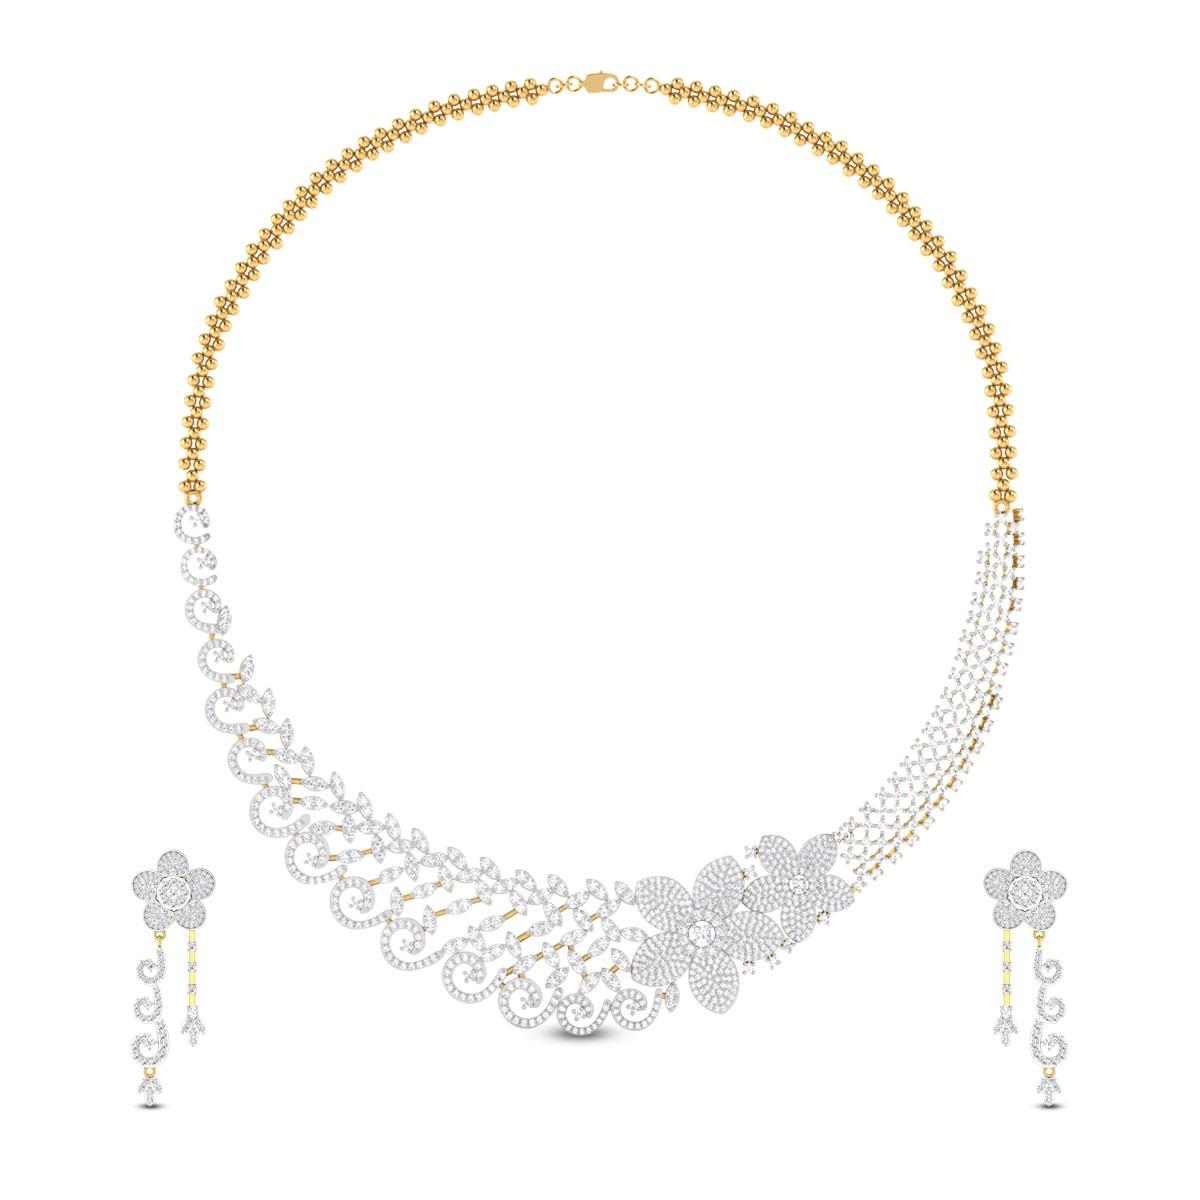 Kameela Floral Diamond Necklace Set